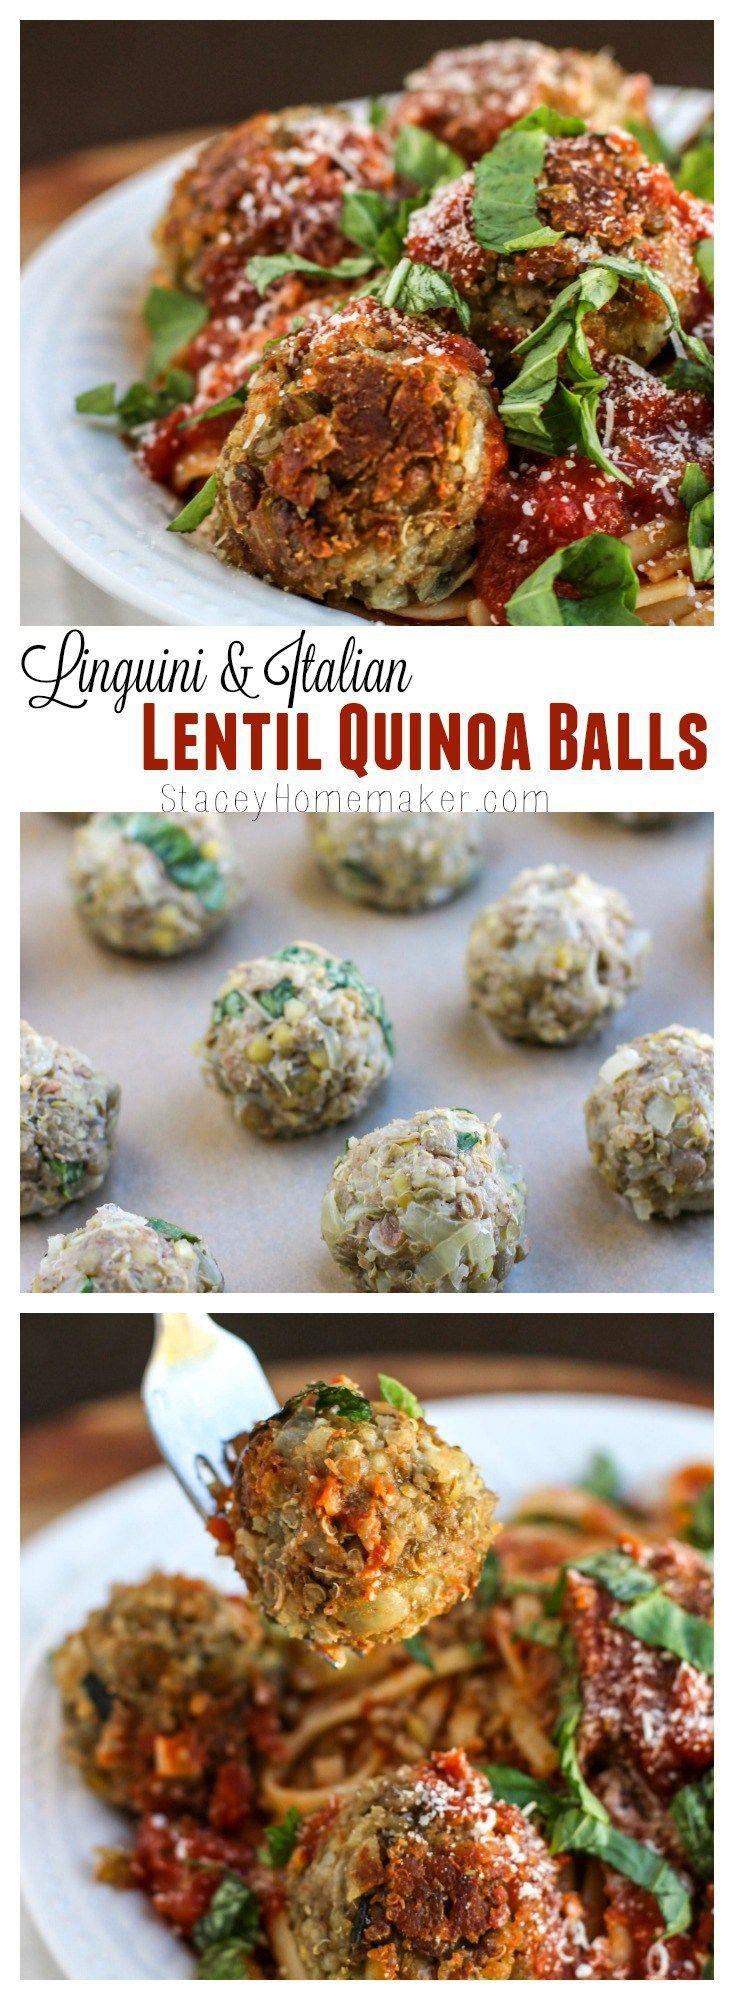 Seafood Recipe Categories Goop Make Recipes Goop Italian Lentil Quinoa  Balls 17 Best Images About Vegan